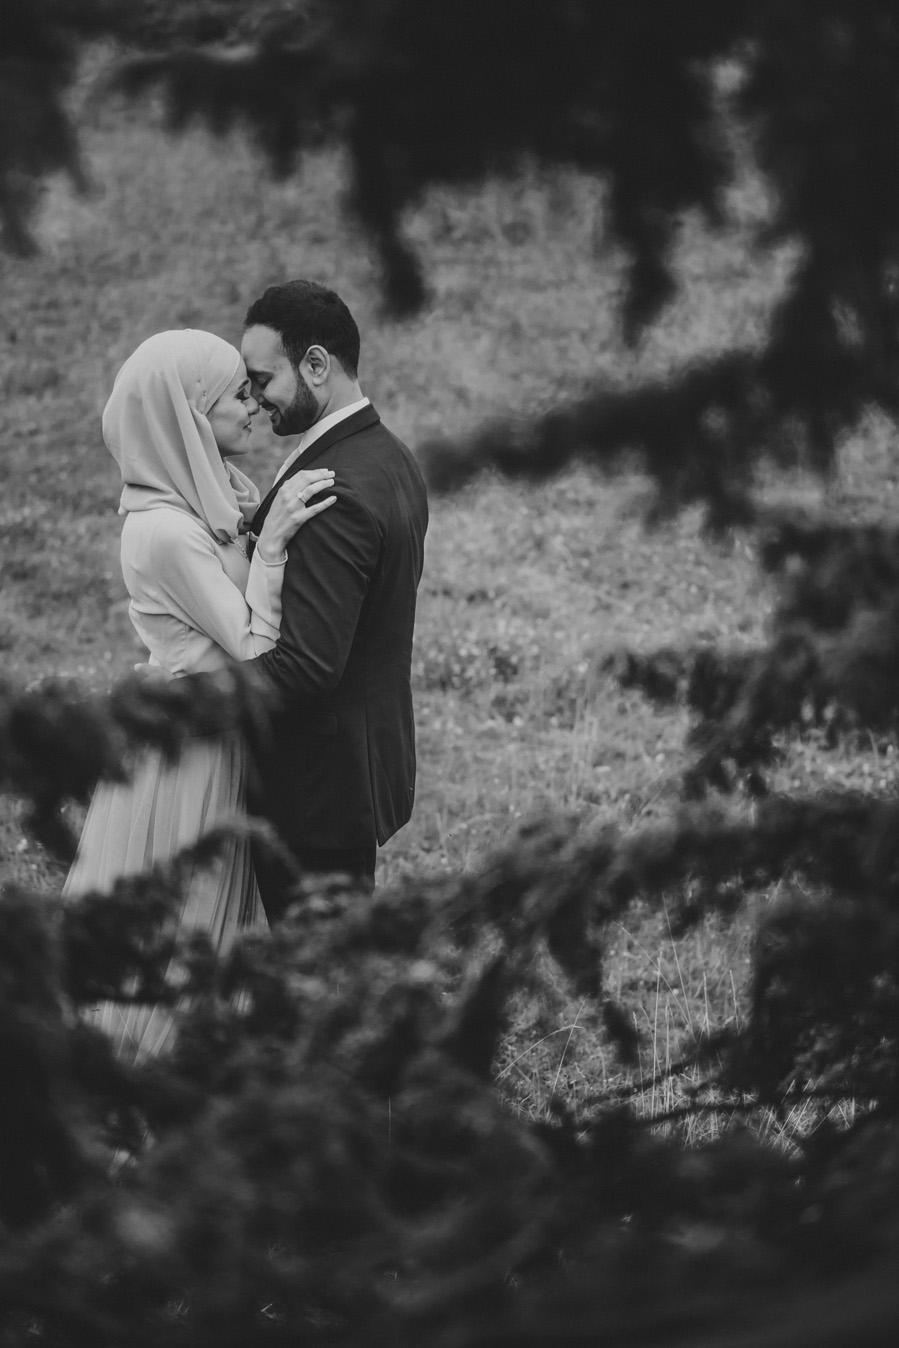 bw,bröllopsfotograf,skåne,muslimskt,hijab,hage